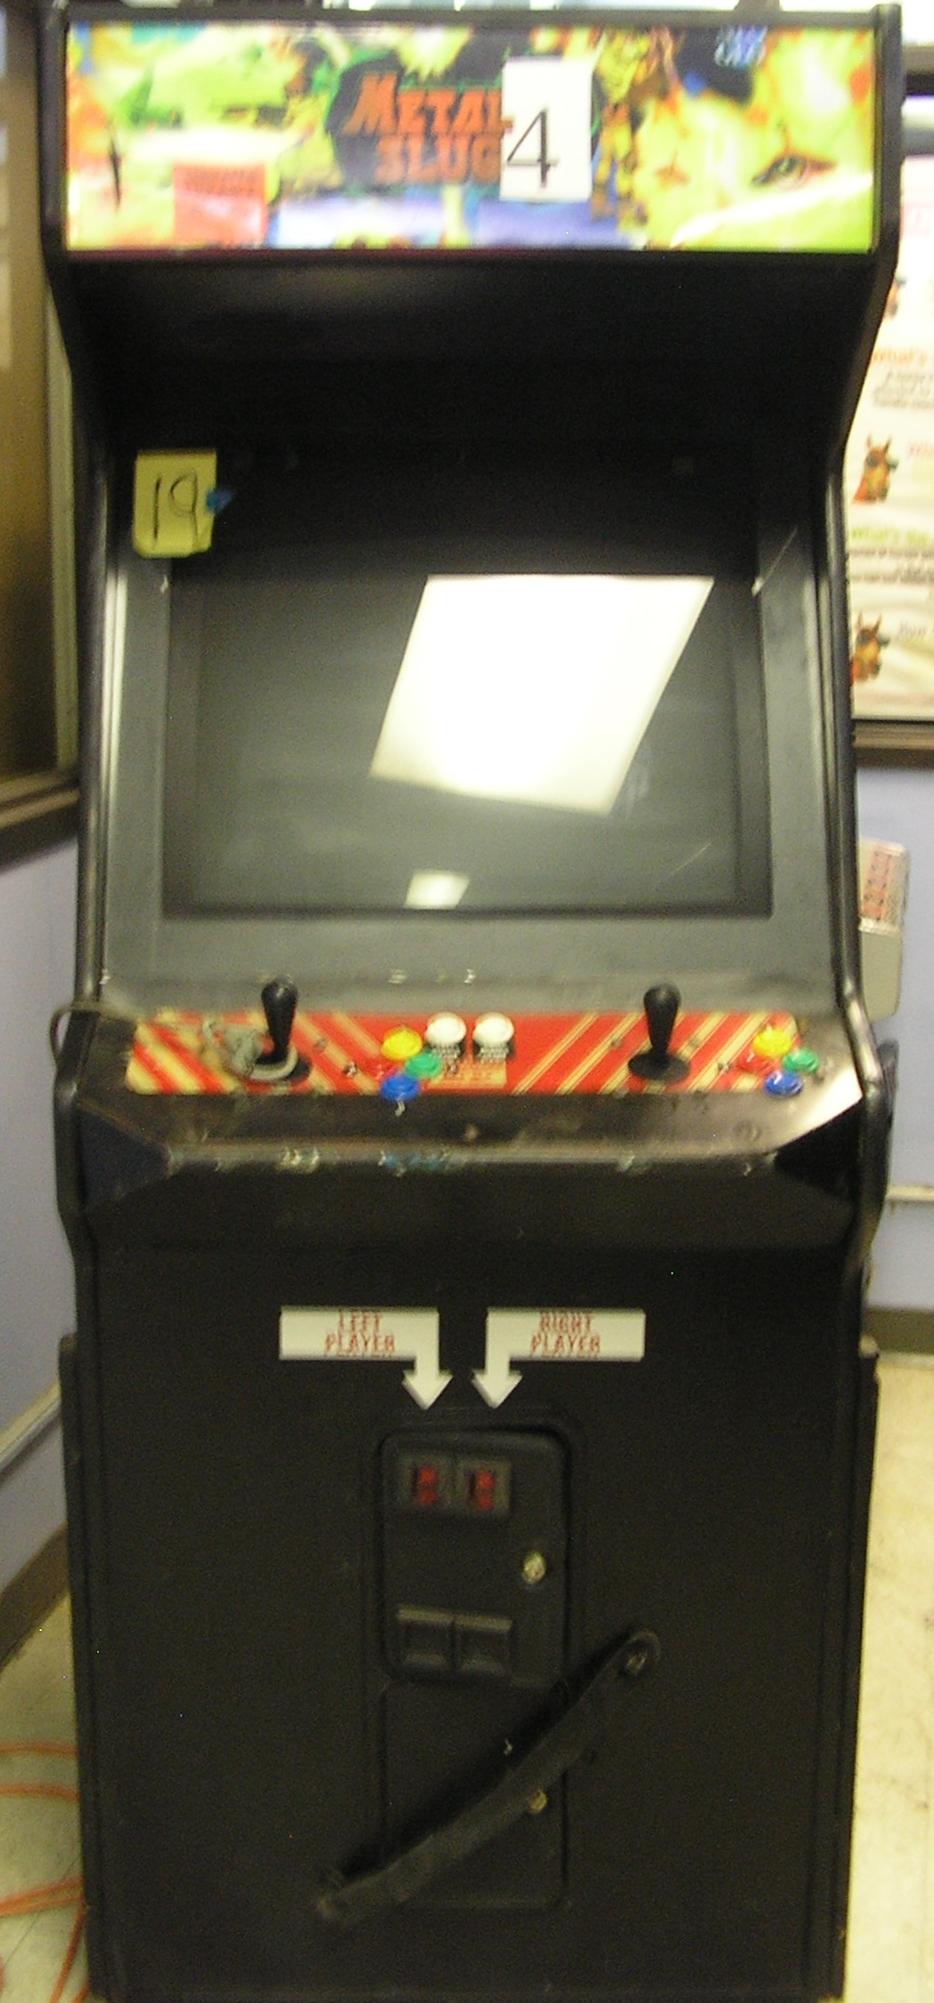 METAL SLUG 4 Arcade Machine Game for sale by SNK! | COIN-OP PARTS ...